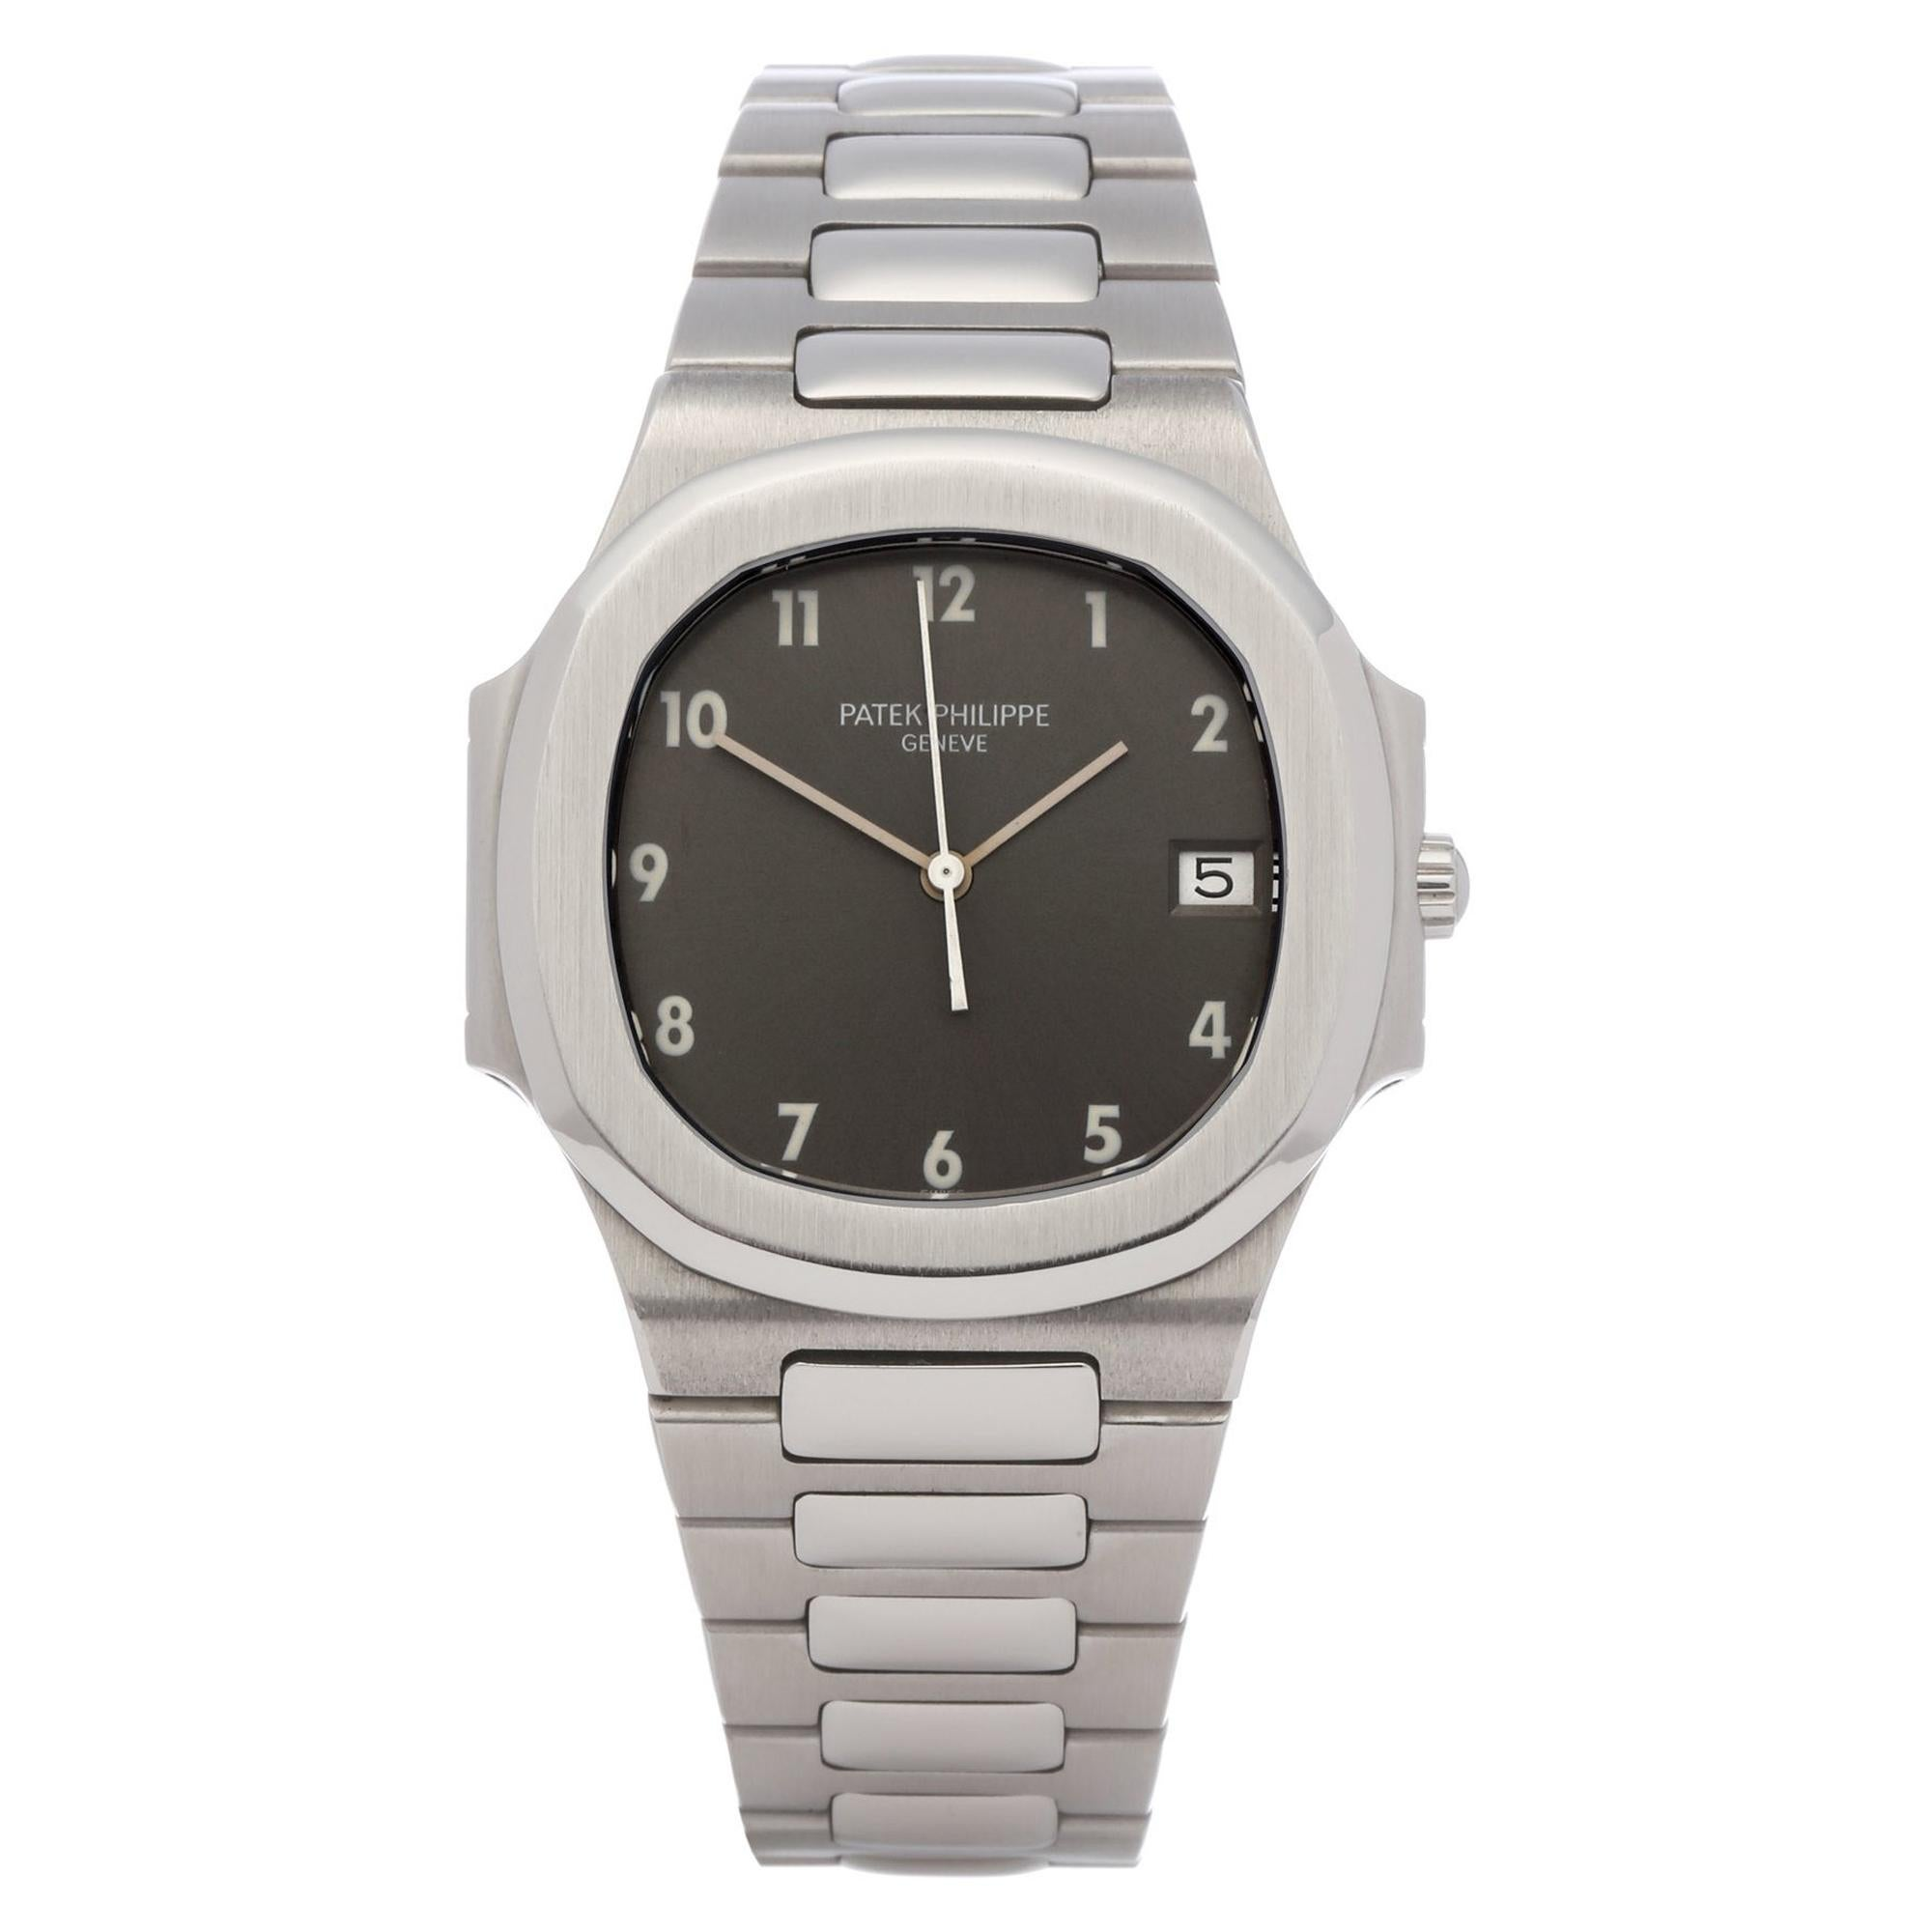 Patek Philippe Nautilus 3900 Unisex Stainless Steel Rare Grey Dial Watch